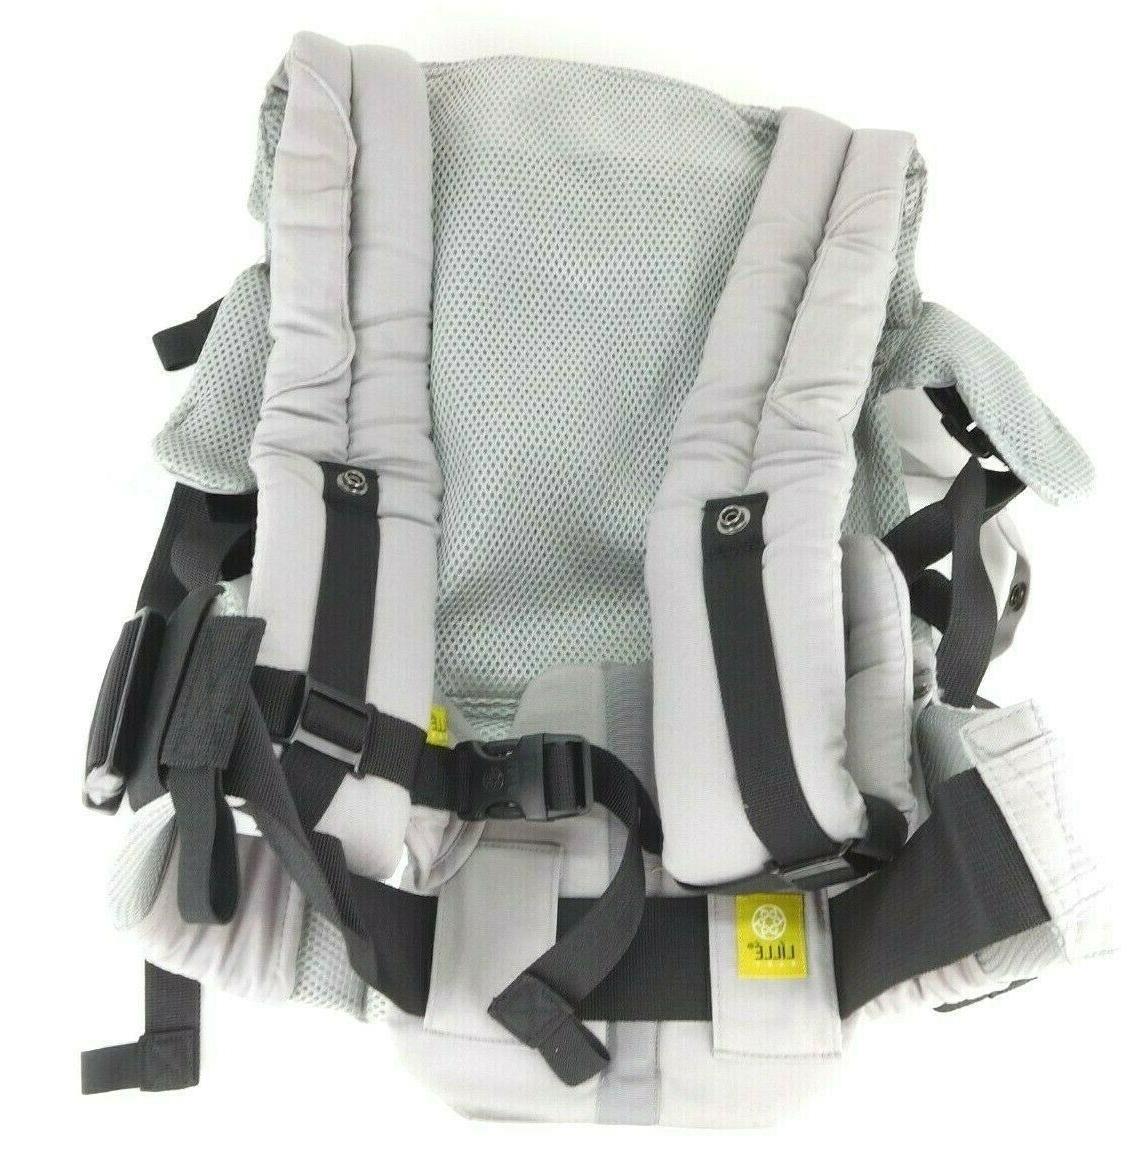 LILLEBABY Airflow 3D Mesh Newborn-Toddler Carrier